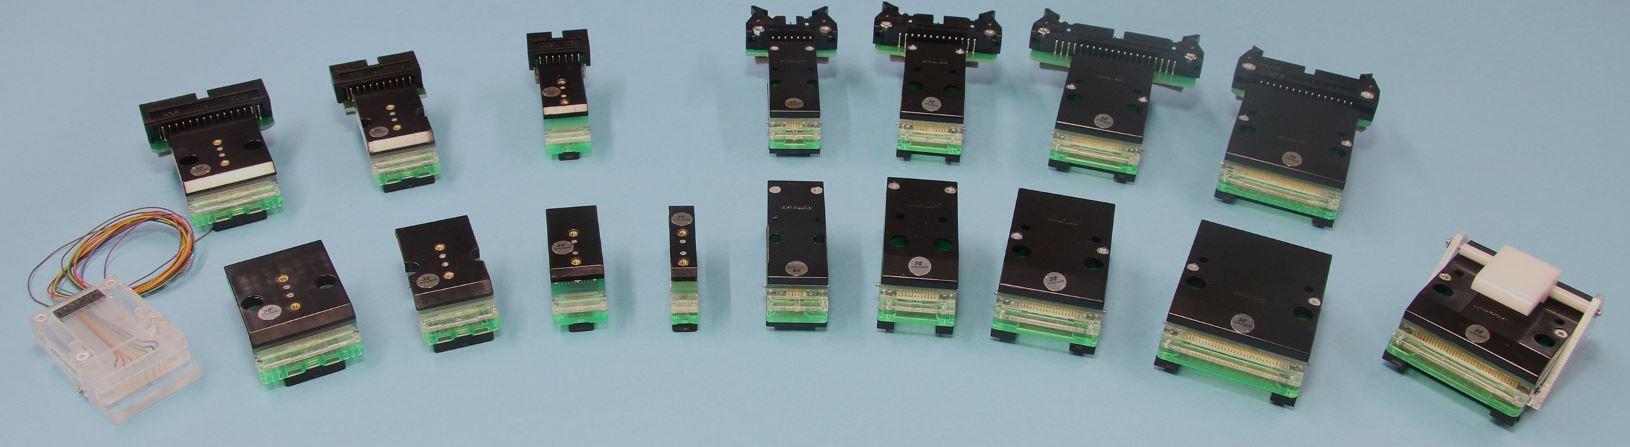 Overview Romex Clip connectoren